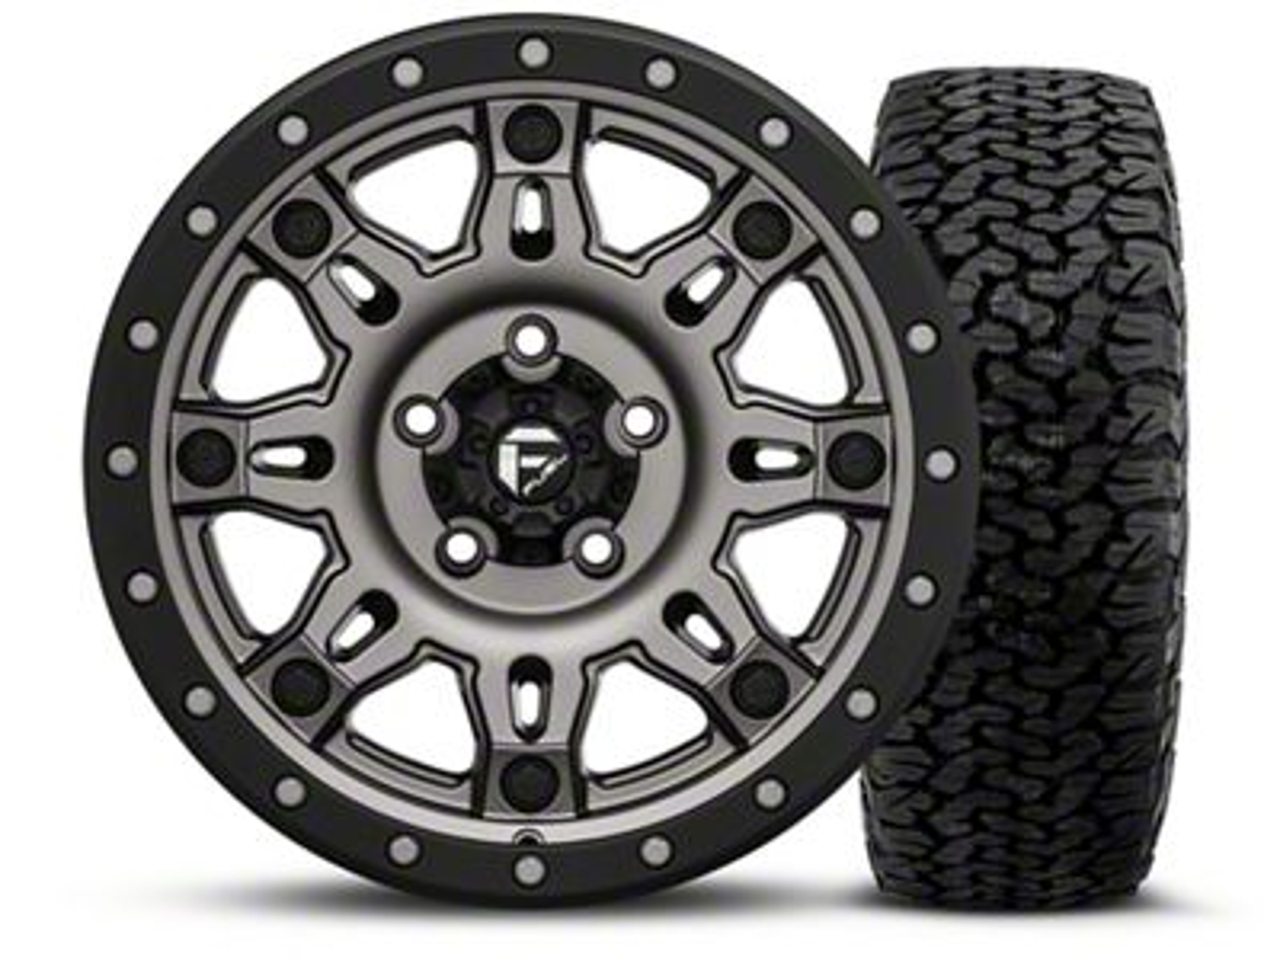 Fuel Wheels Hostage III Gunmetal and Black - 17x9 Wheel - and BF Goodrich All Terrain TA KO2 Tire - 315/70R17 (07-18 Jeep Wrangler JK)